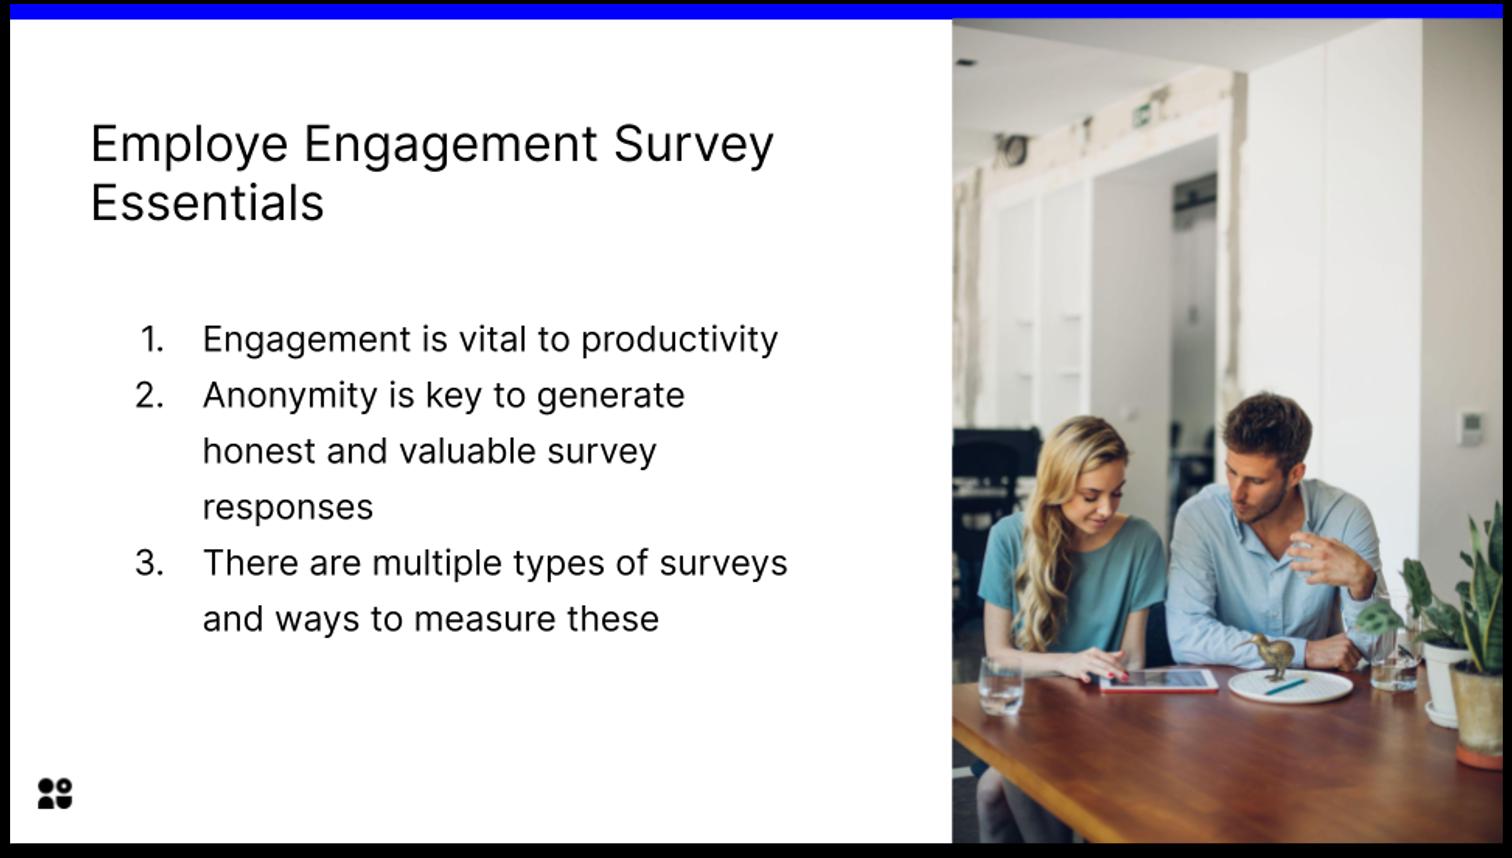 Employee Engagement Survey Essentials